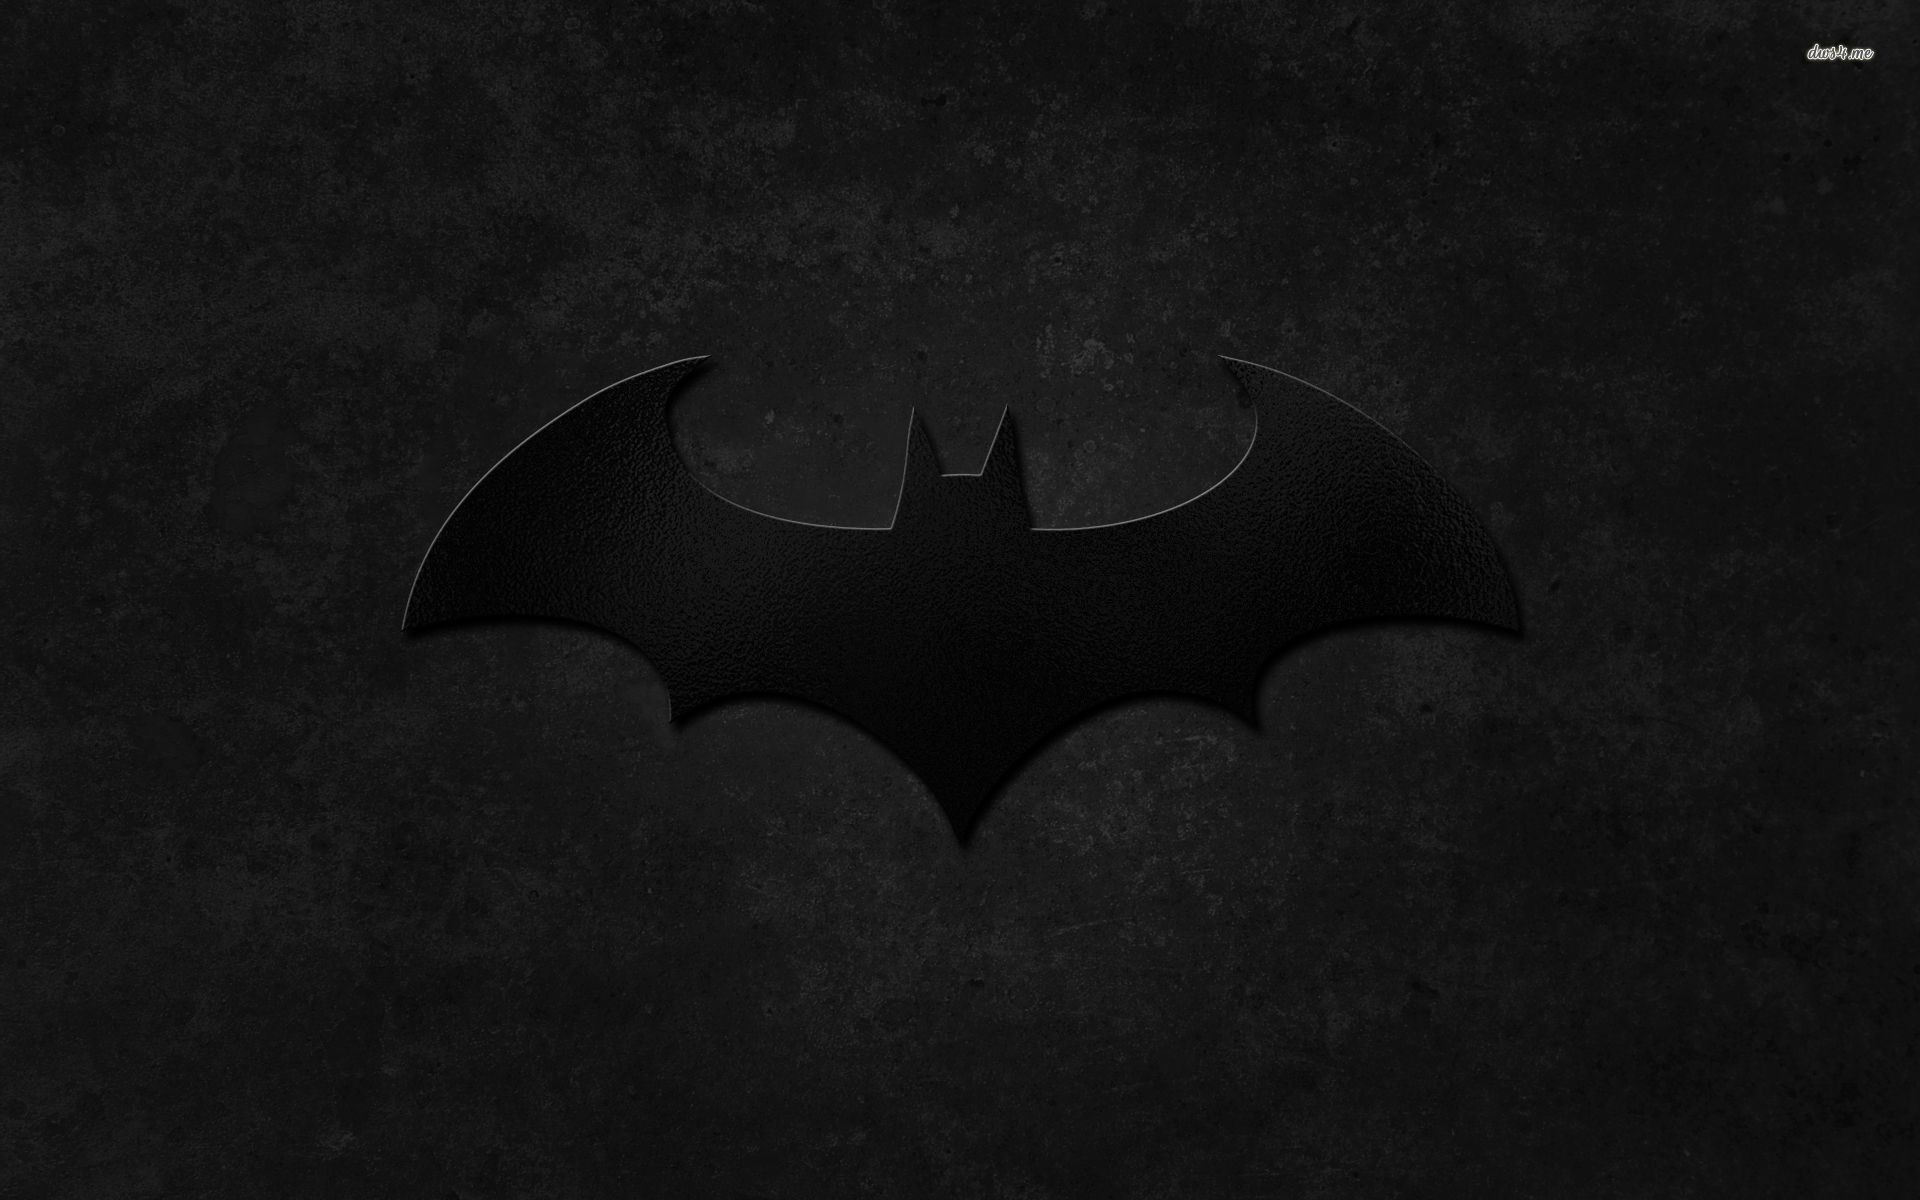 Black Batman Logo wallpaper – Digital Art wallpapers – #43078